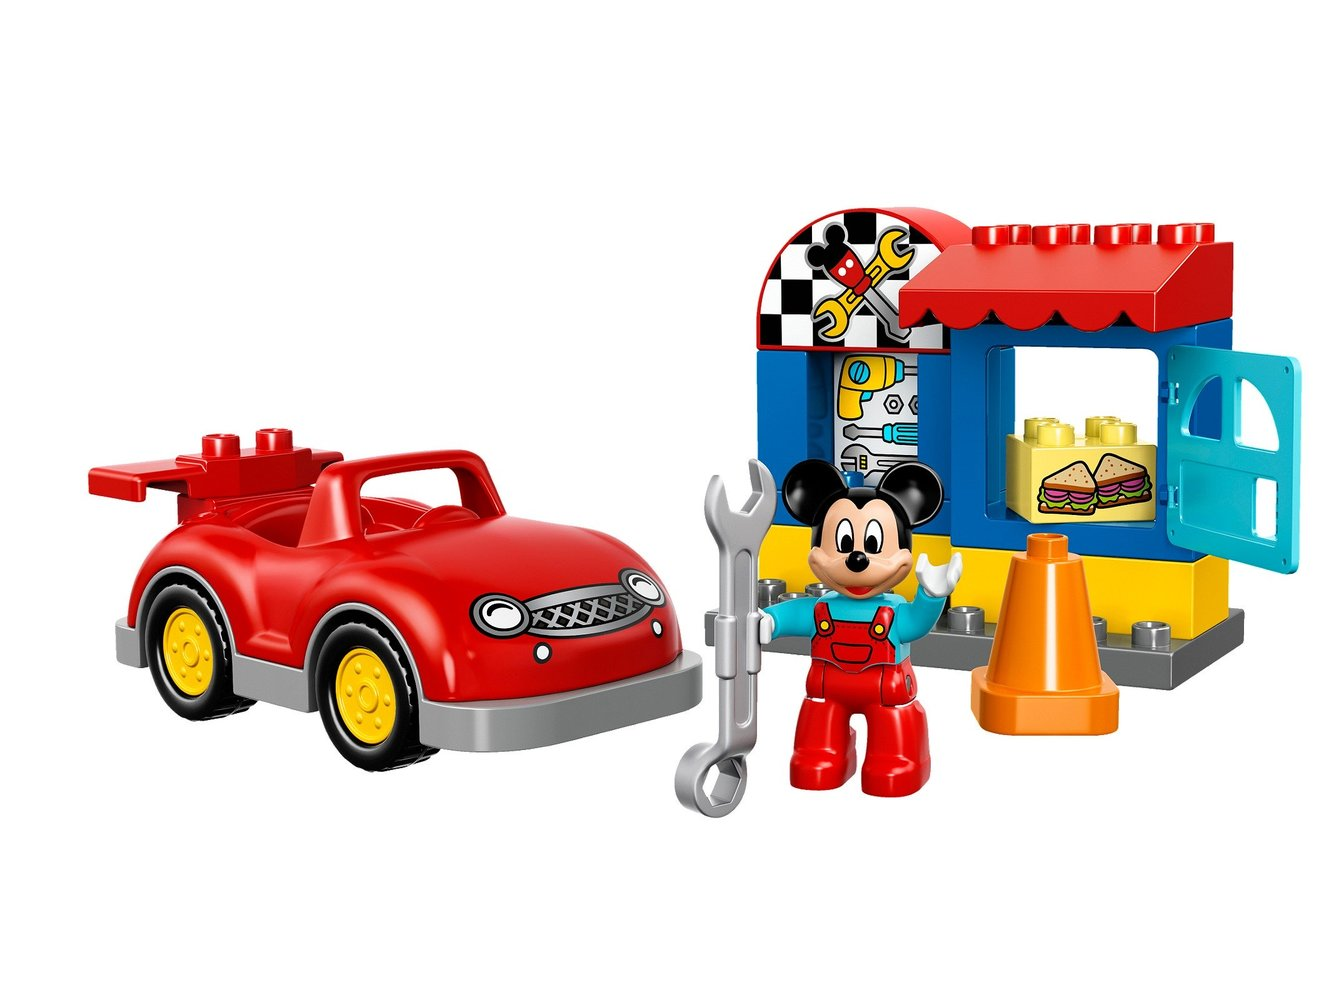 Mickey's Workshop